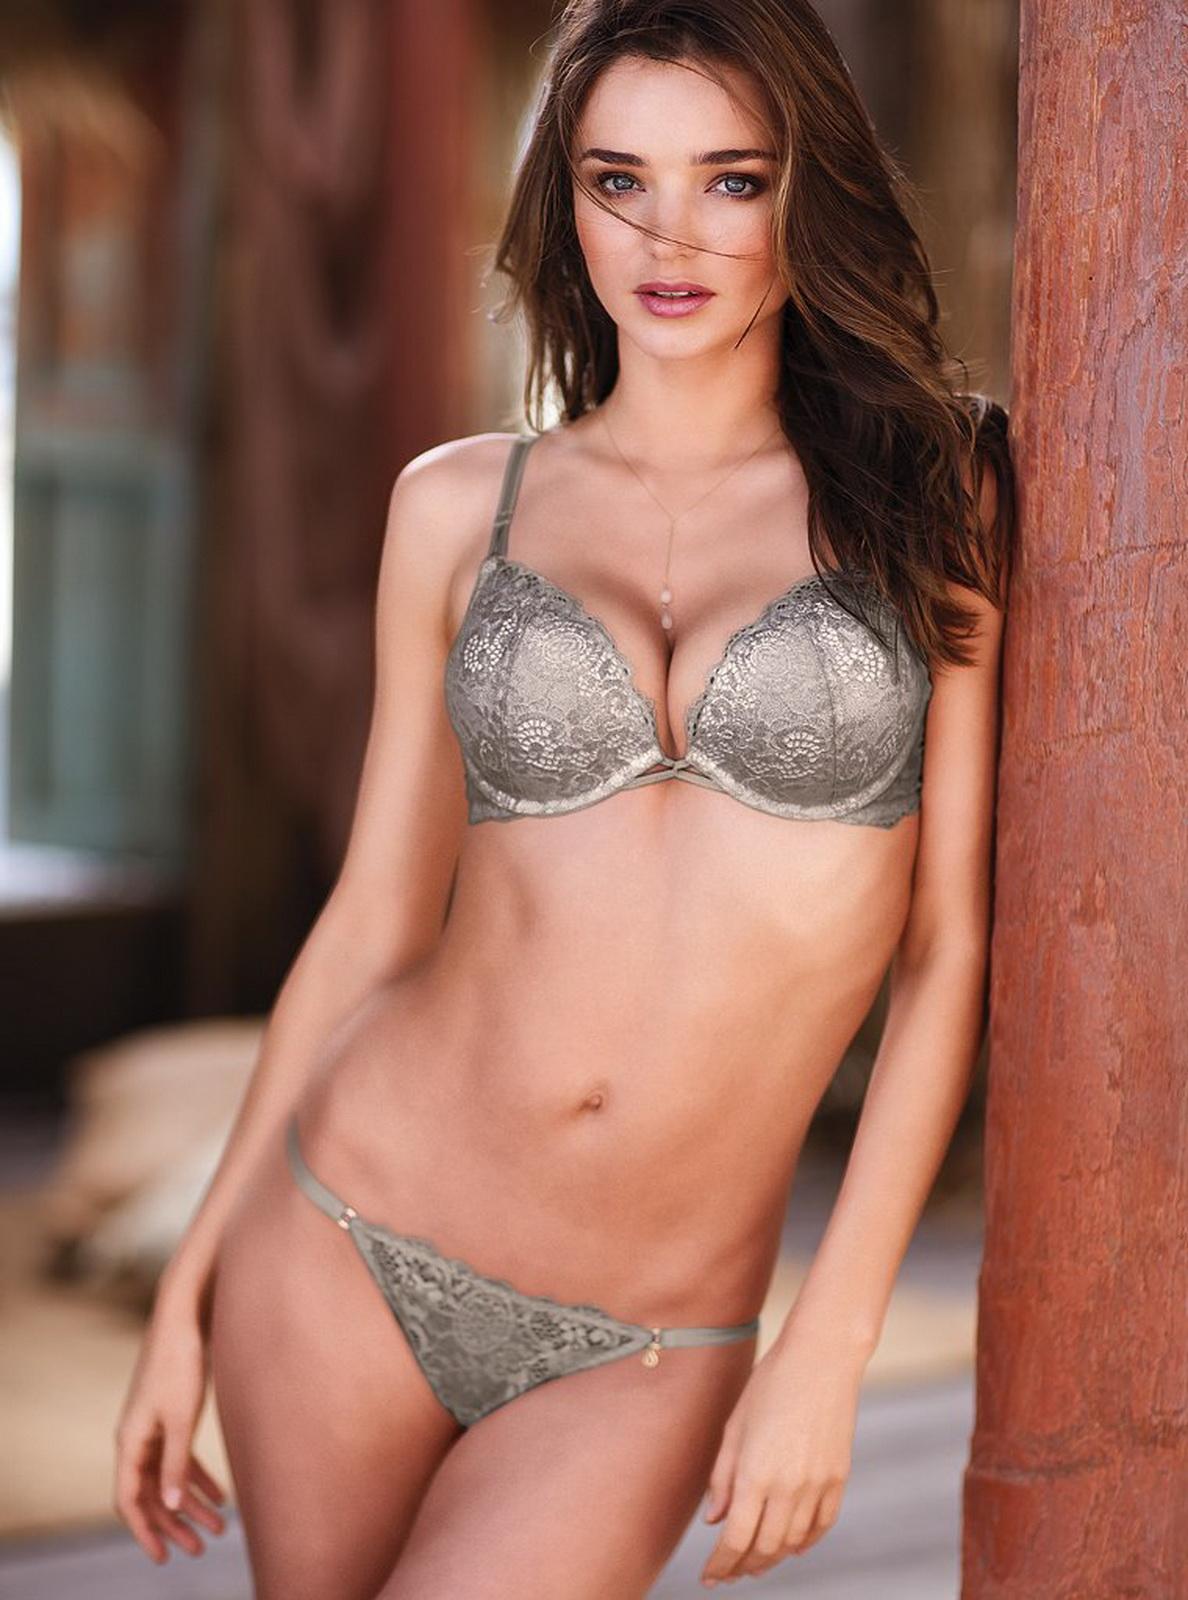 http://1.bp.blogspot.com/-kKXl_AsFtD4/T5qJz9EEe2I/AAAAAAAAAig/bCCLWDXOo30/s1600/Miranda+Kerr+hot+in+sexy+Victoria%27s+Secret+lingerie+3.jpg